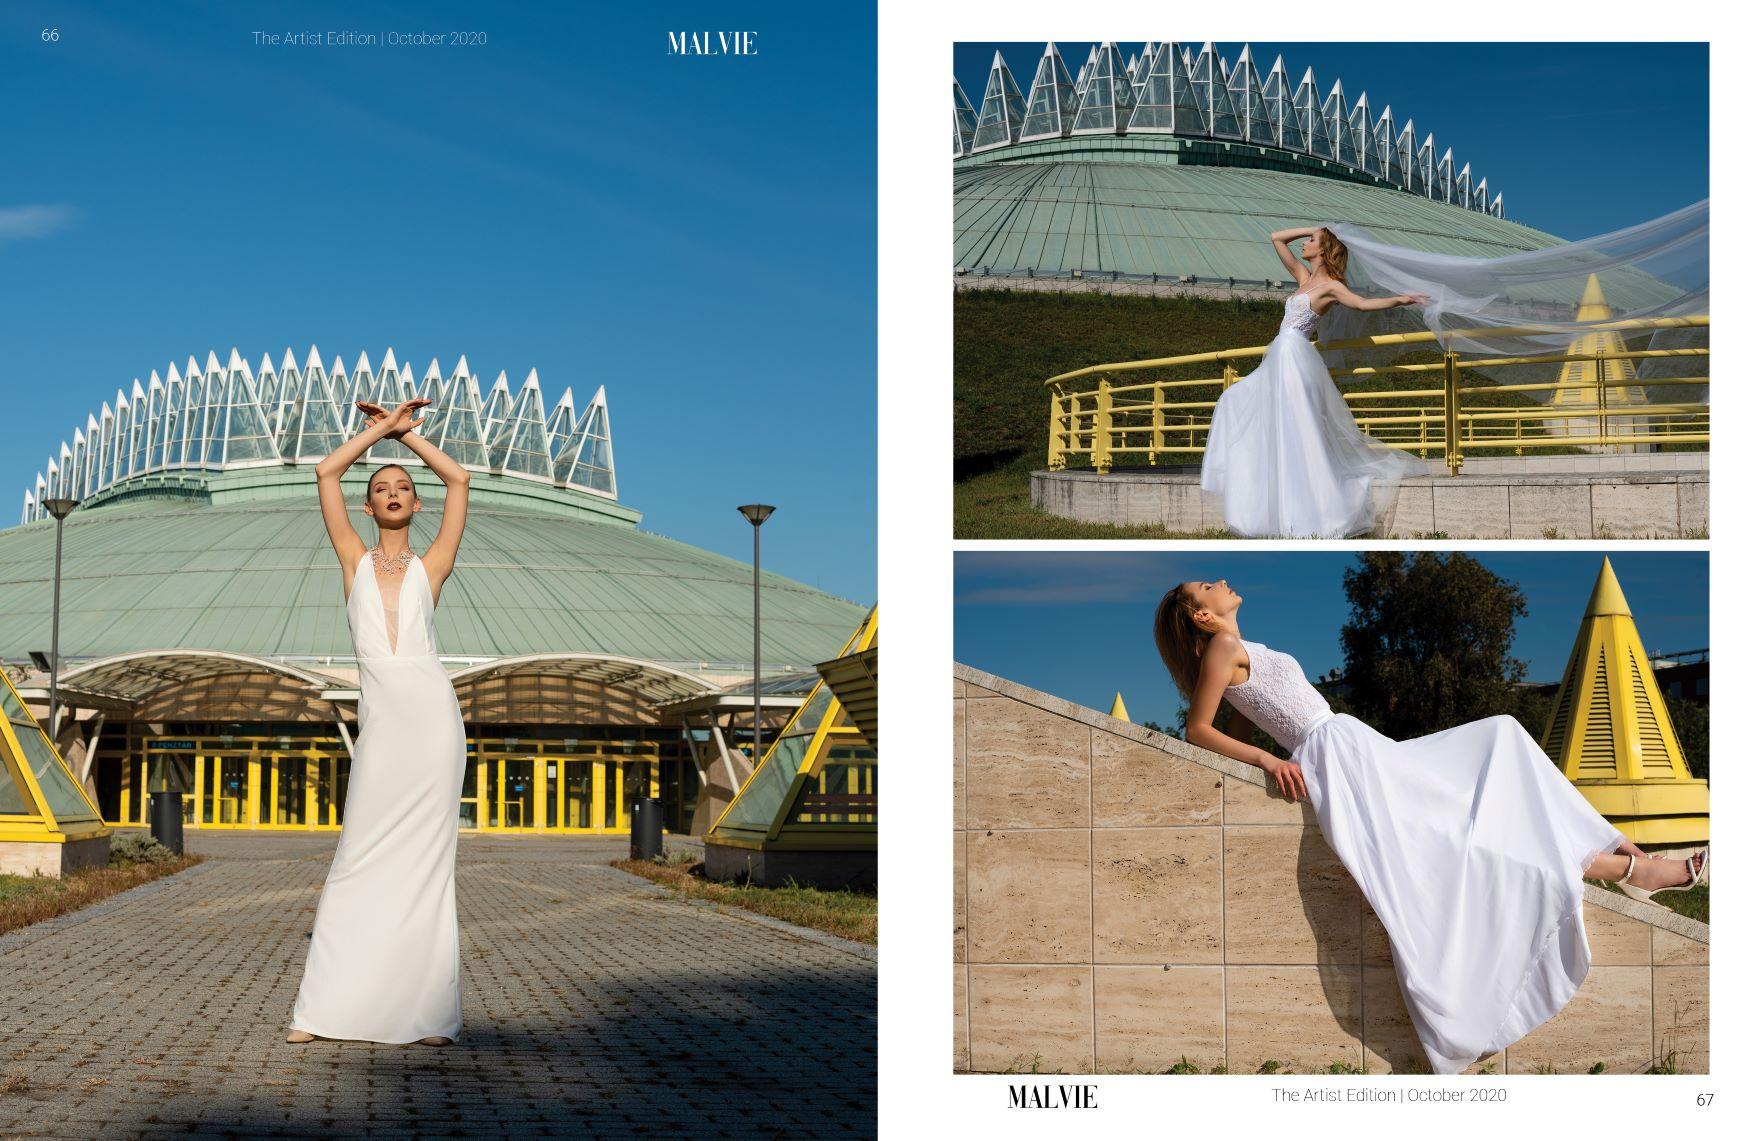 MALVIE Mag The Artist Edition Vol 37 October 2020 spreads34